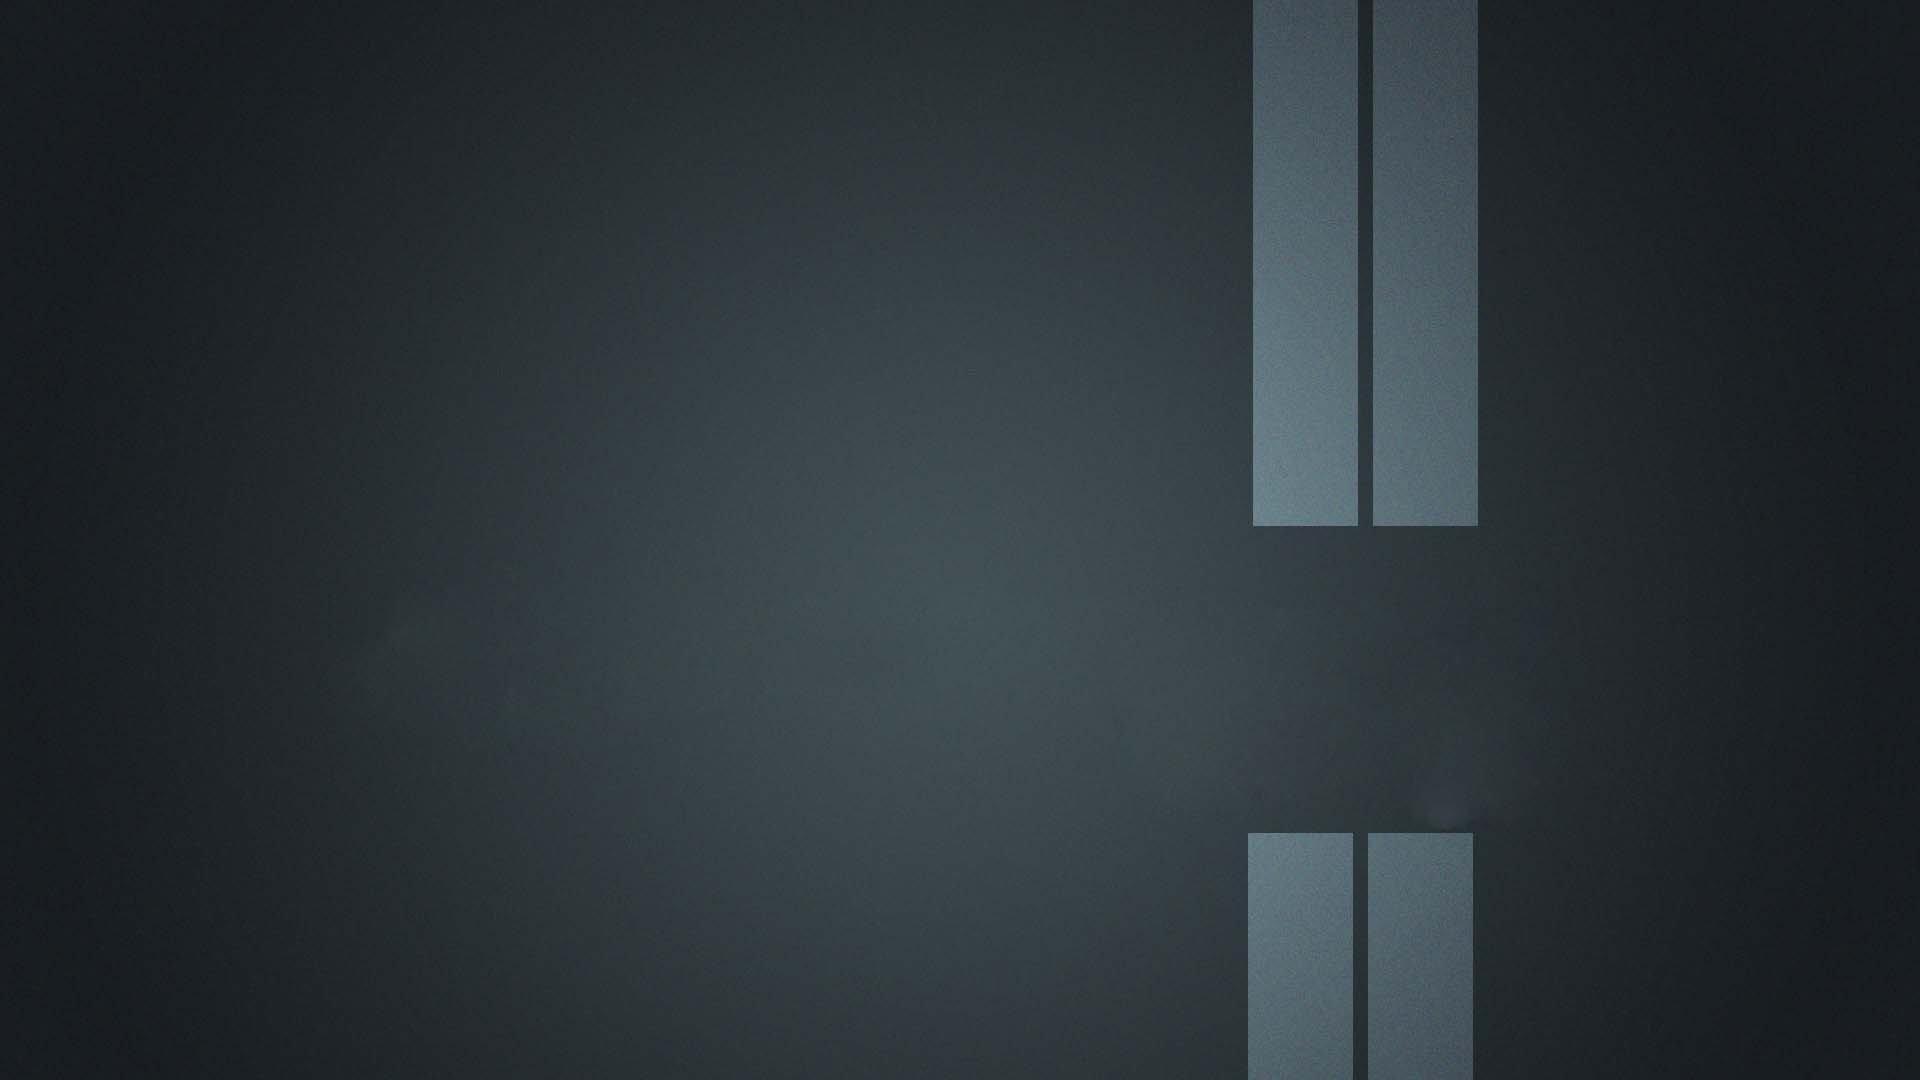 Plain Wallpaper HD 1920x1080